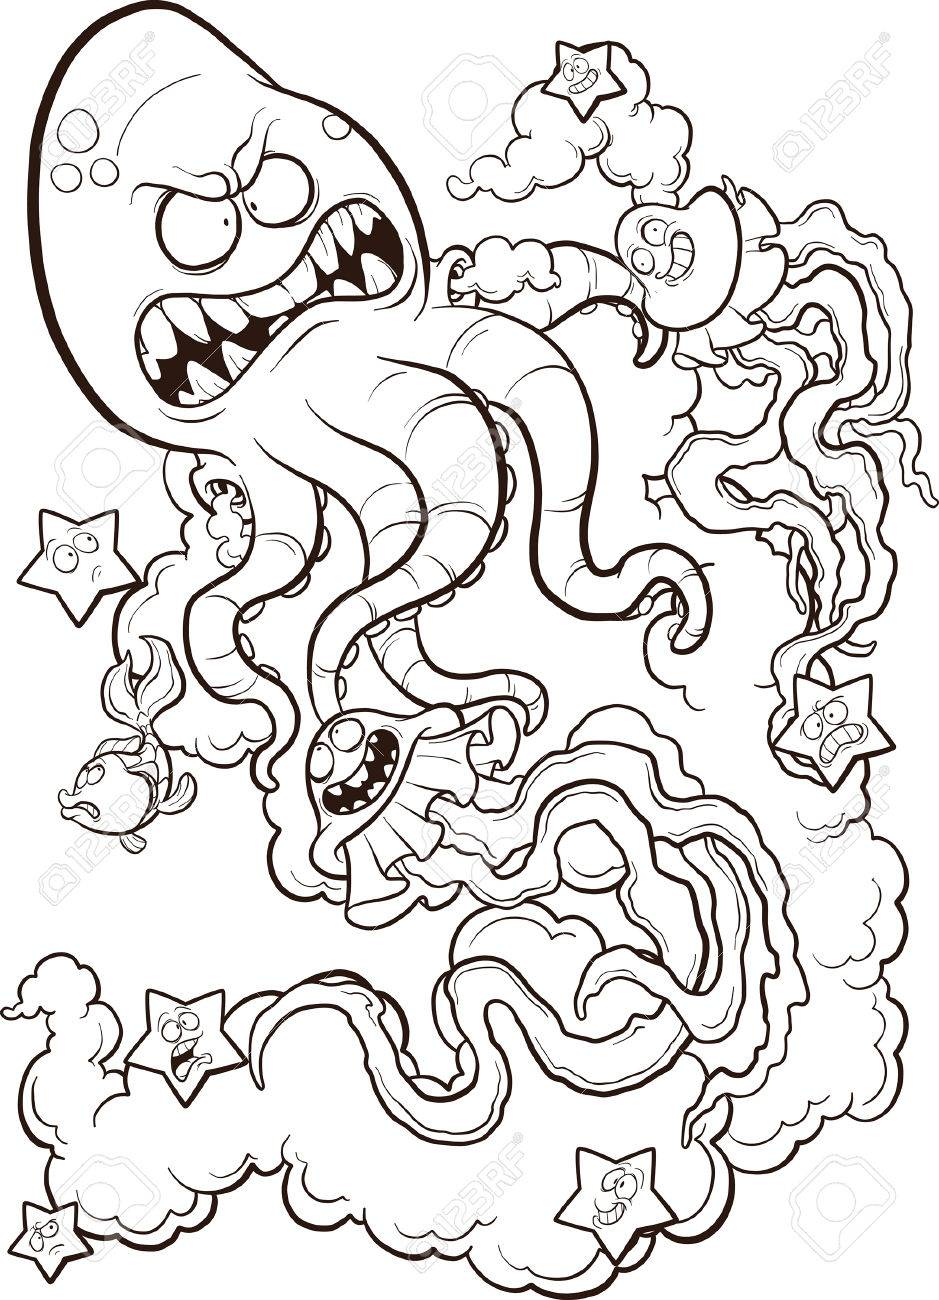 Dibujo Lineal De Un Pulpo Lucha Contra Un Par De Medusas. Vector ...